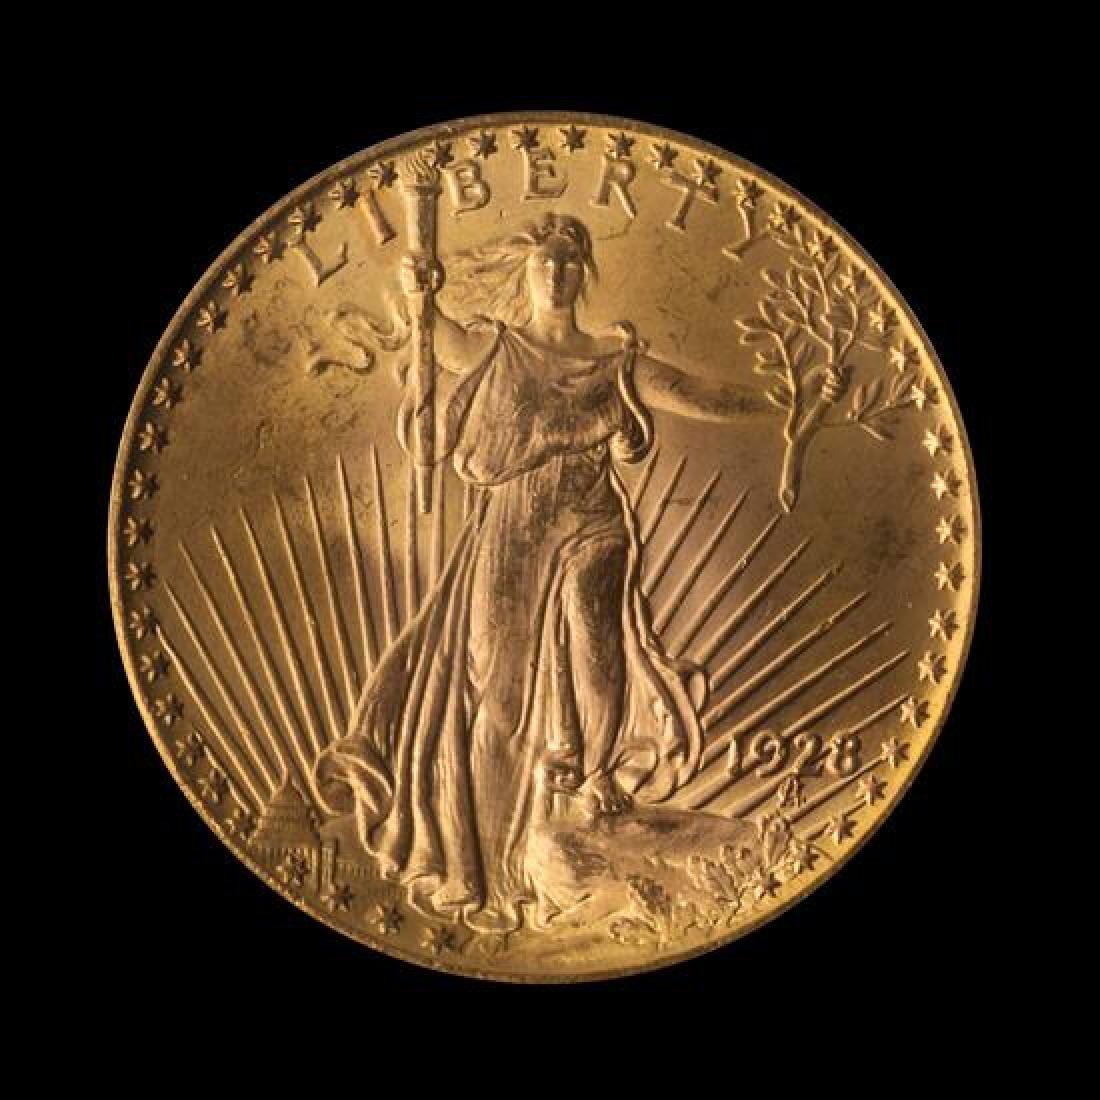 A United States 1928 Saint-Gaudens $20 Gold Coin